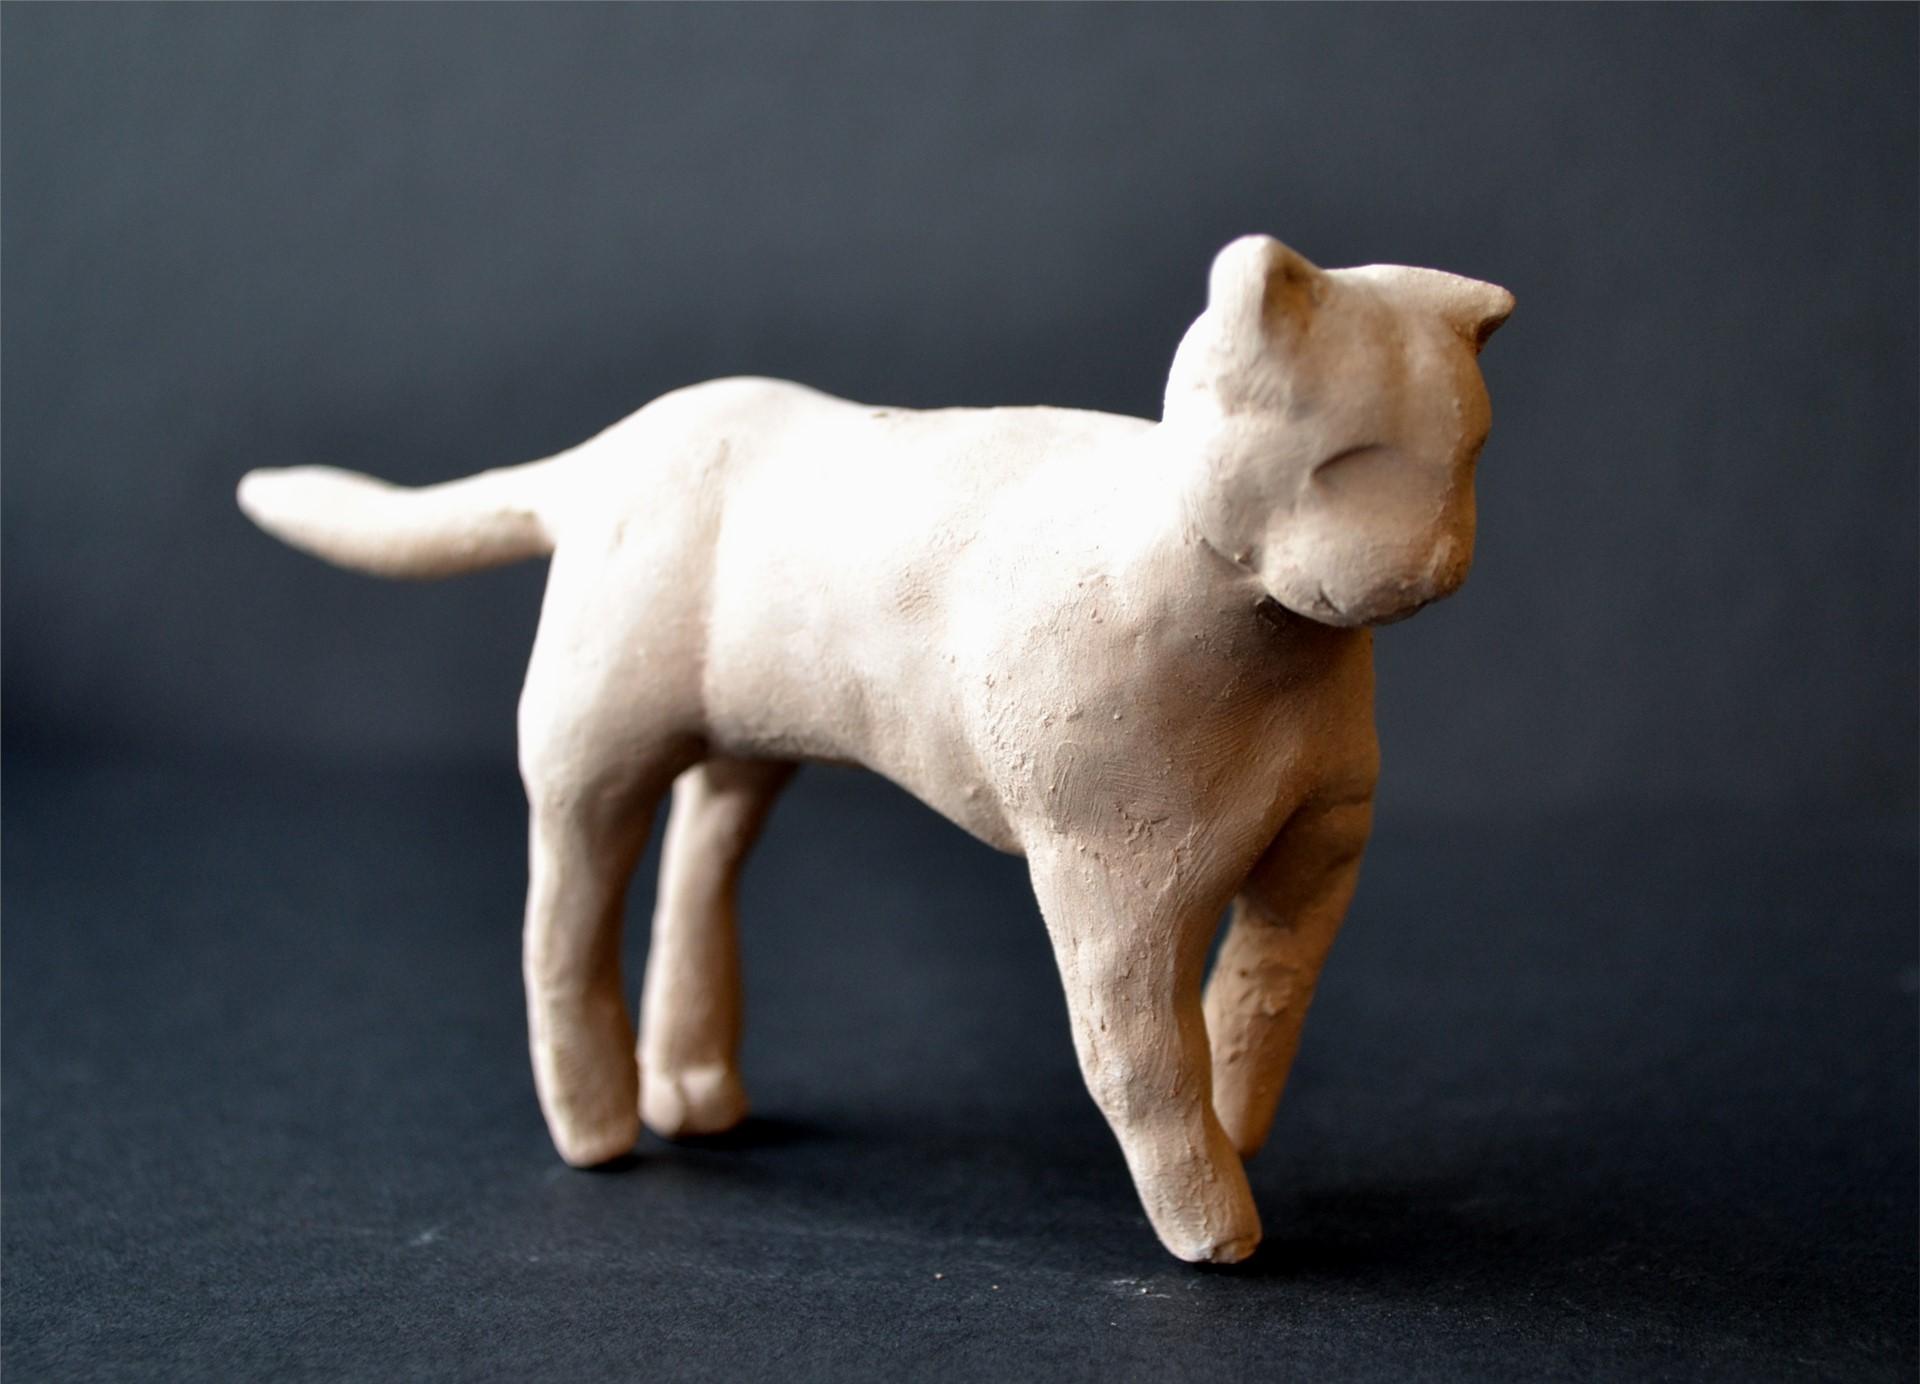 RACHEL ZOON, Ceramic Cat, Independent Study, 3 x 5 x 1.25, 2015